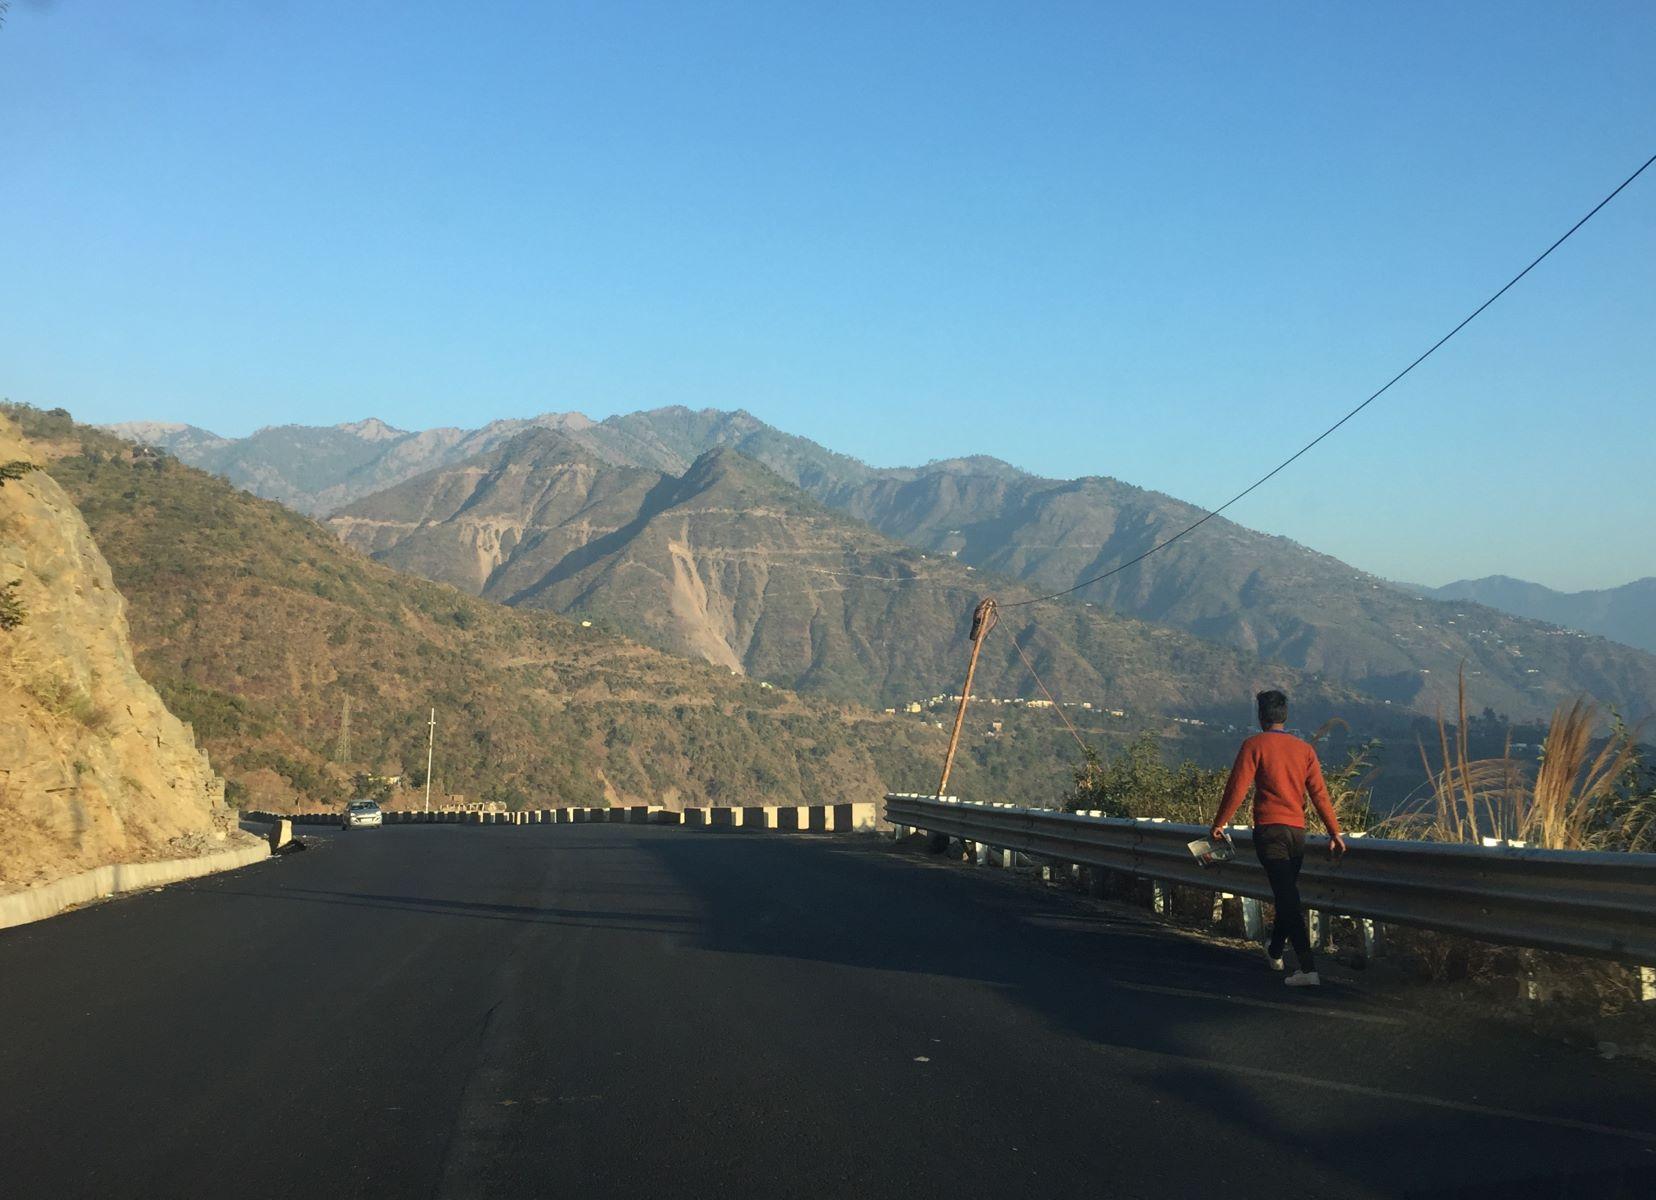 NH-58 National Highway goes through Ganesh's village Bhallegaon in Tehri District